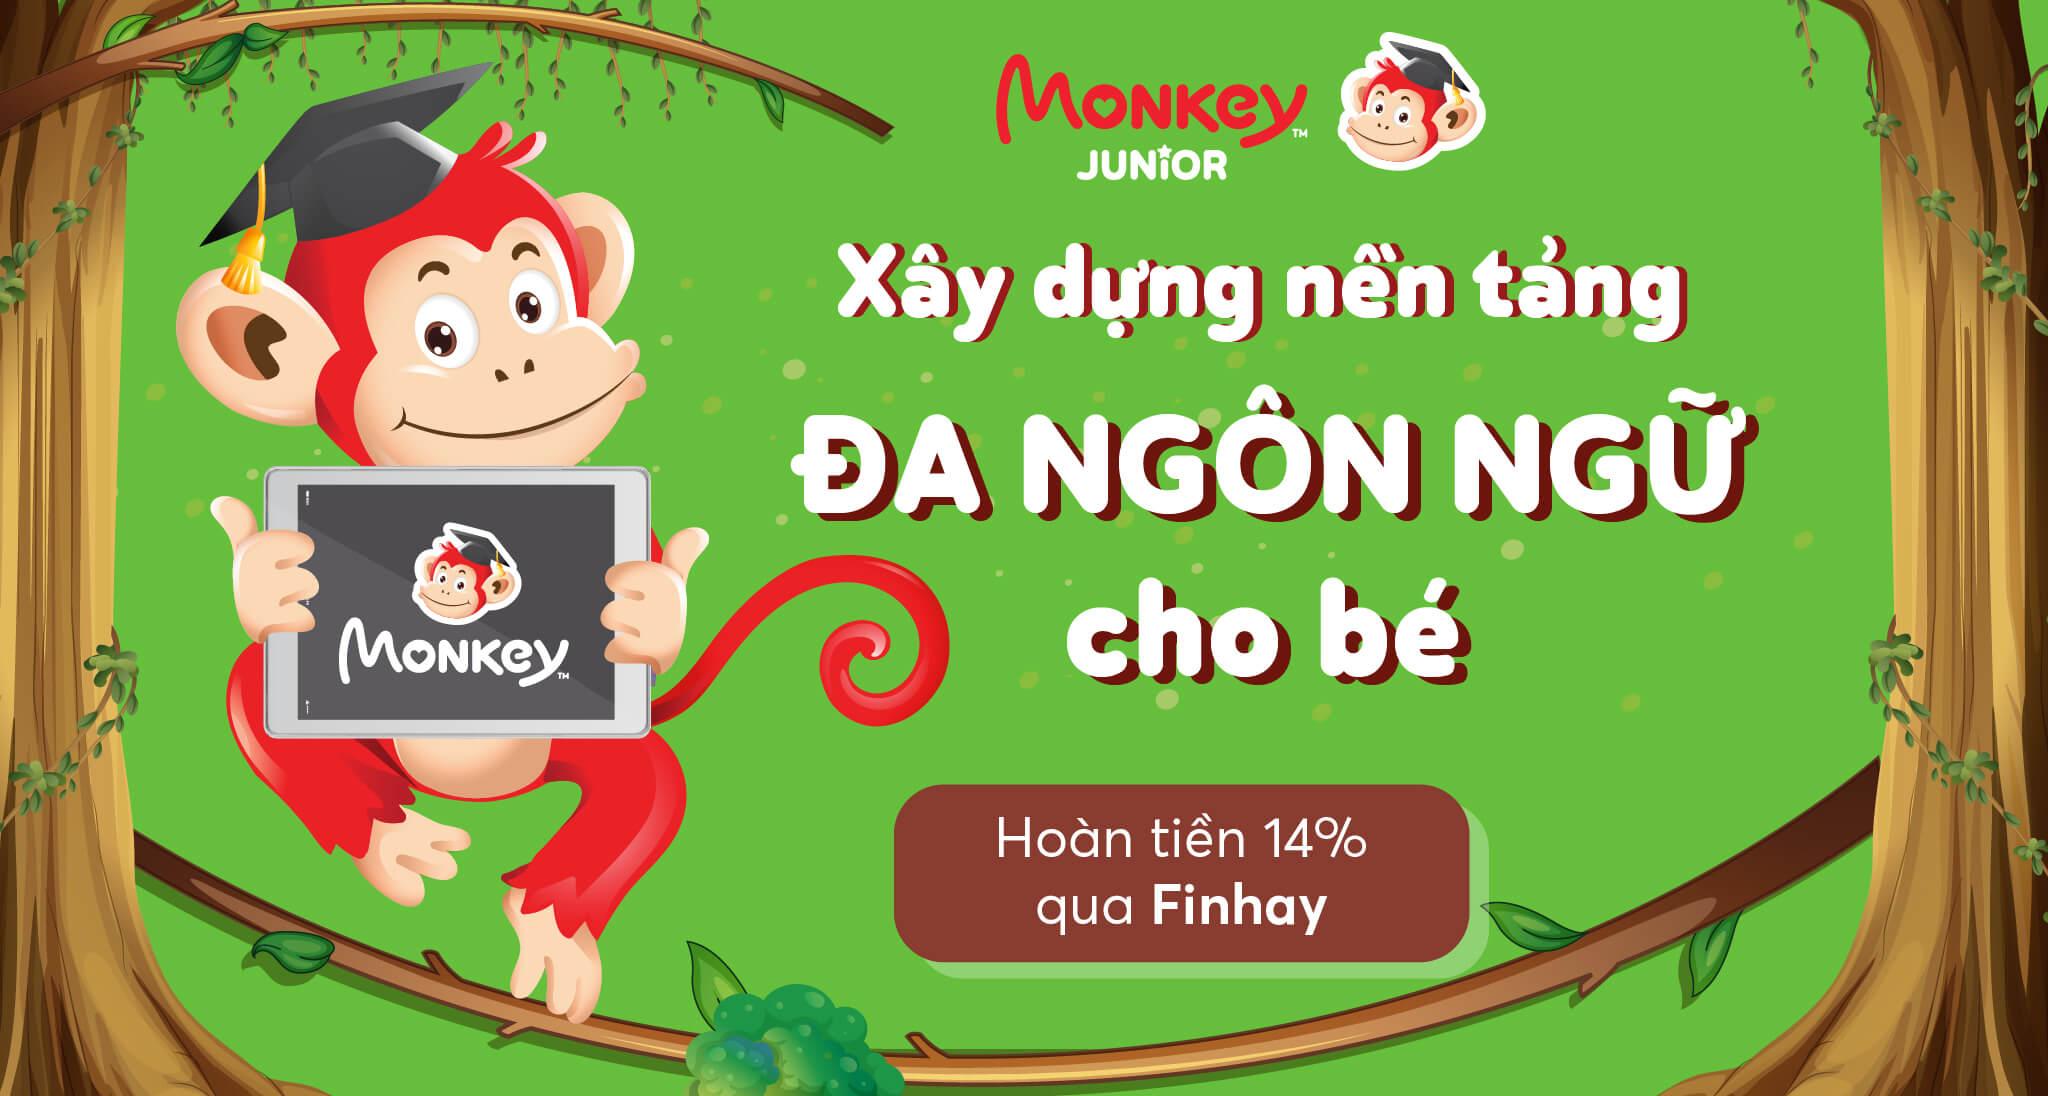 Finhay hoàn tiền - Monkey Junior